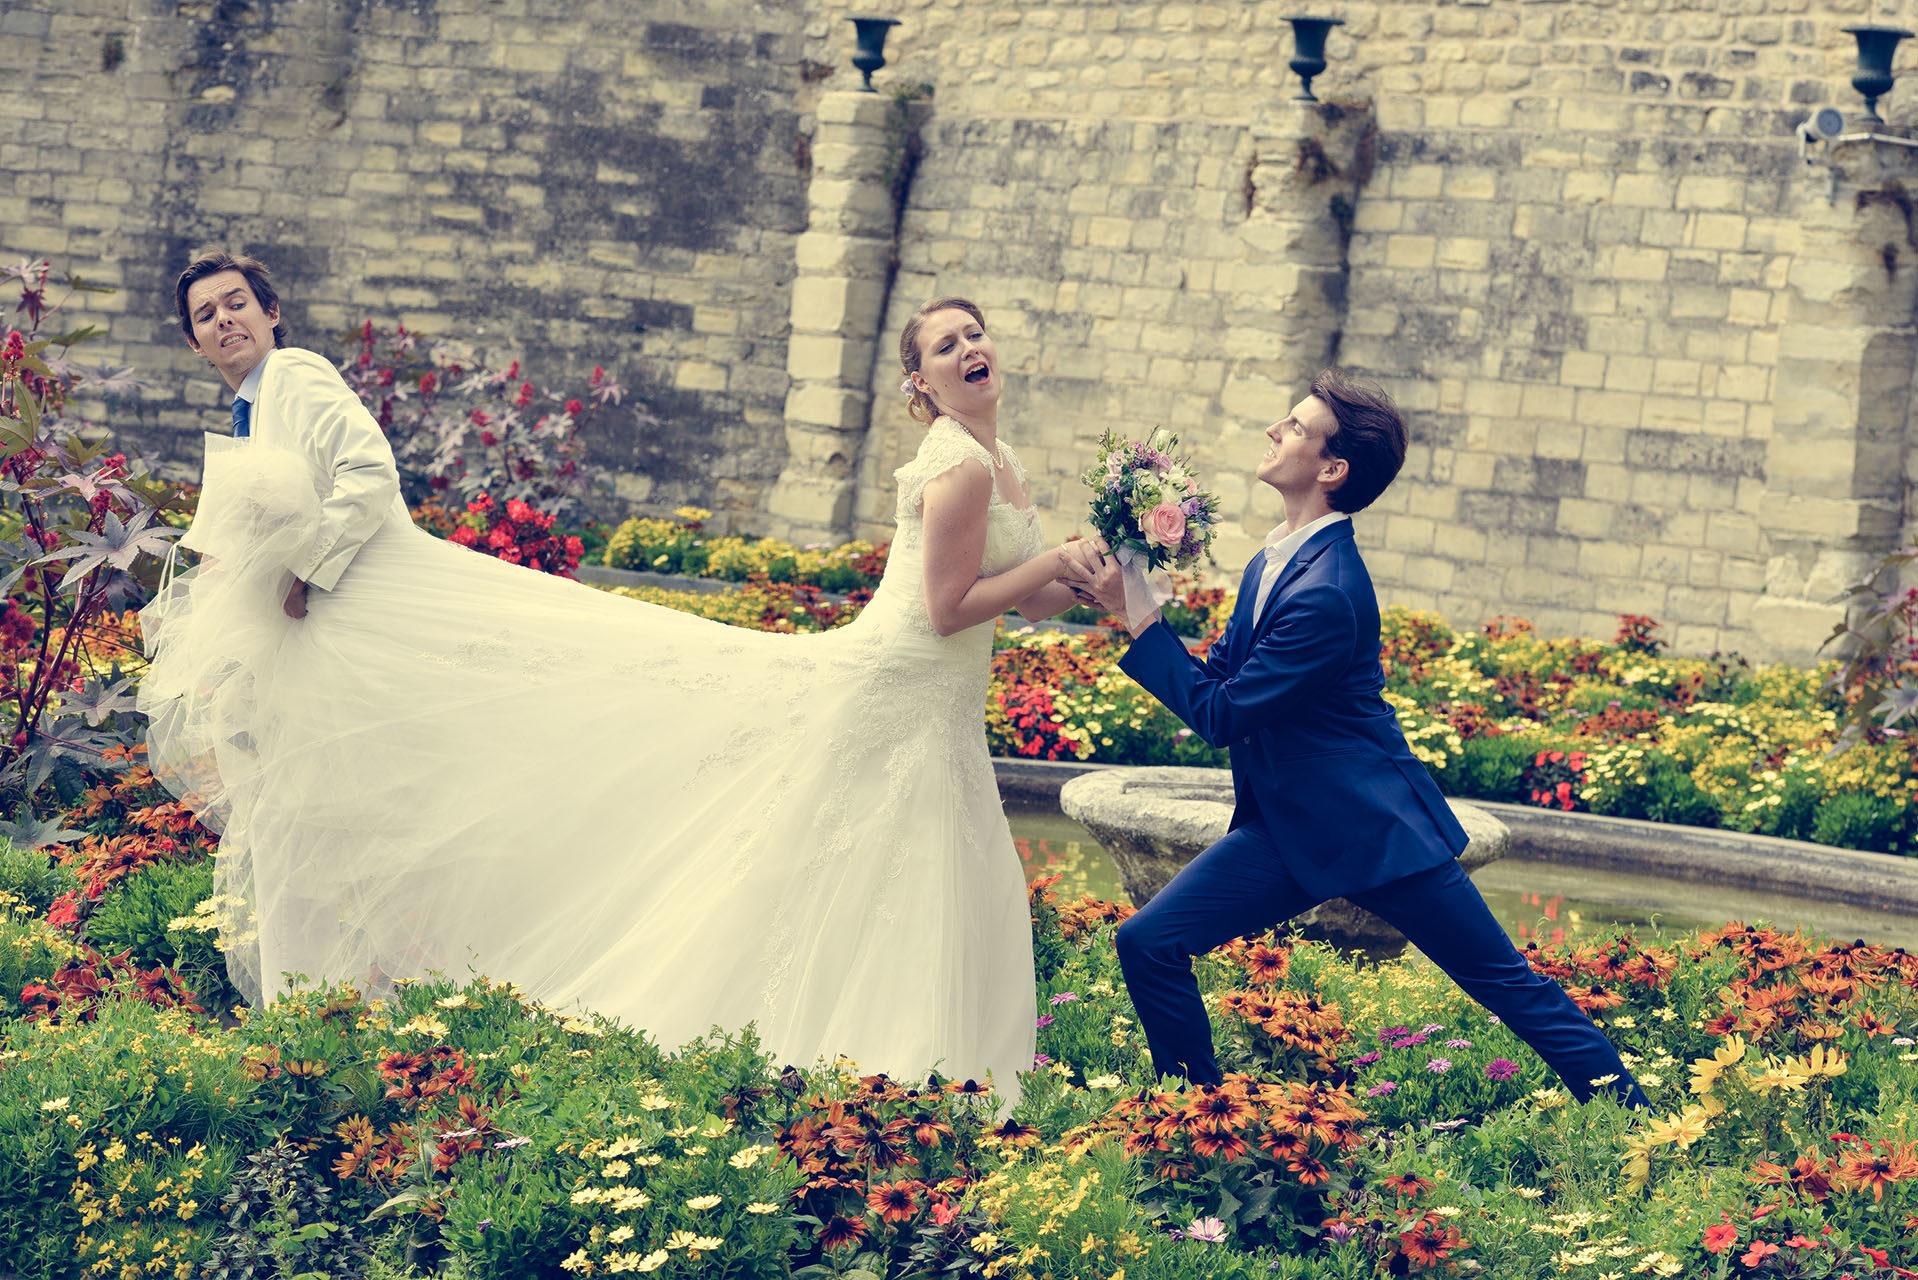 mariage-hauts-de-seine-maya-angelsen-photographe